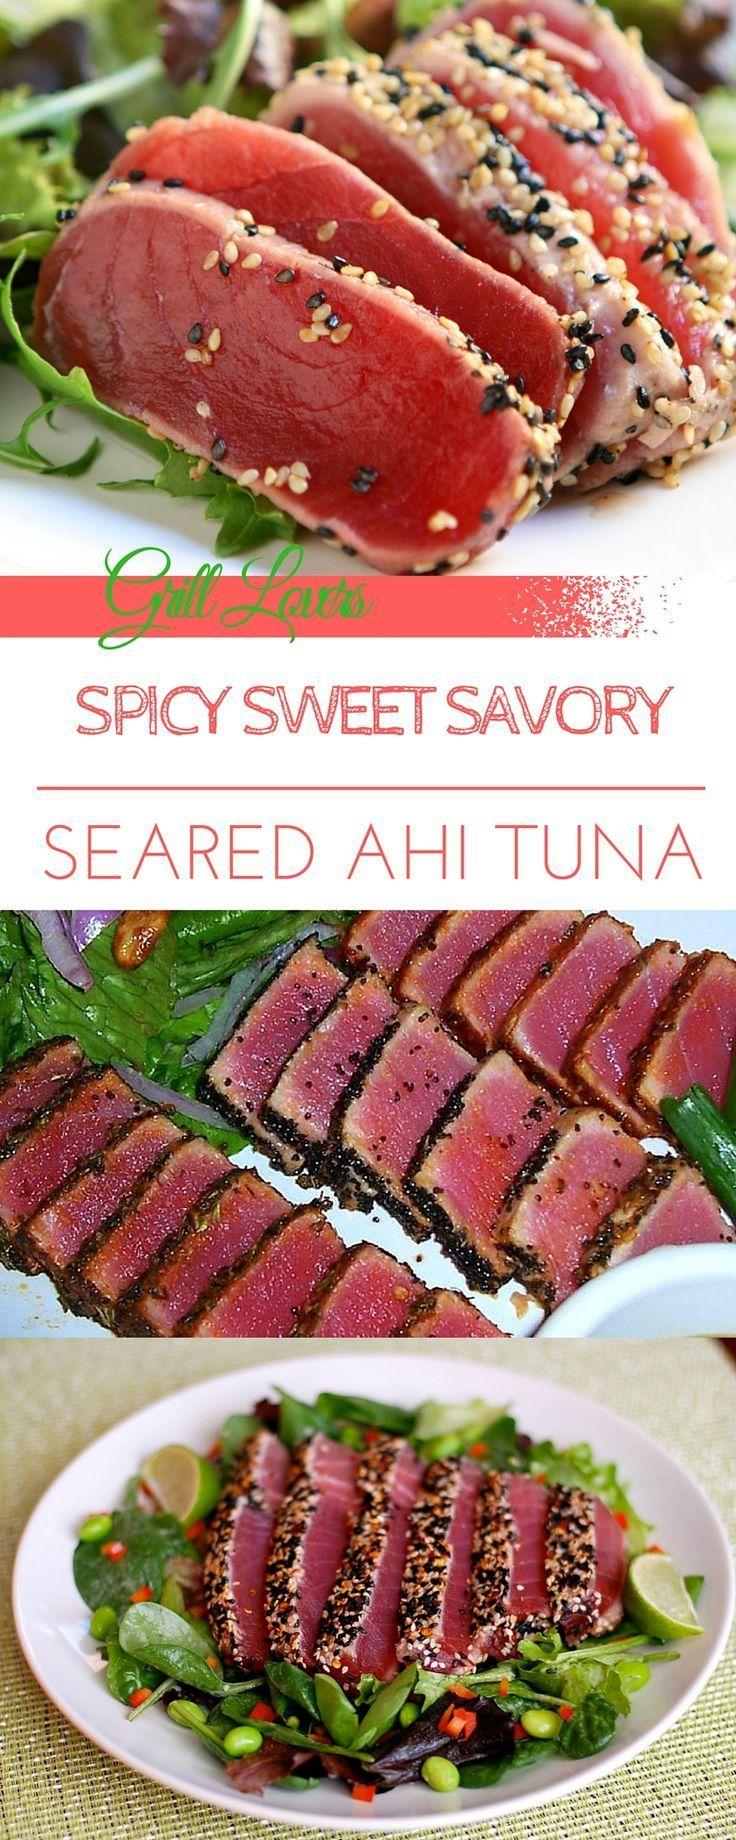 Printgrill Lovers Spicy Sweet Savory Seared Ahi Tuna Recipe Ingredients 2 Lbs Ahi Tuna Steaks 1 4 Cup Soy Sauce 1 4 Cup Honey 1 4 Cup Seared Ahi Tuna Recipe Food Fish Recipes